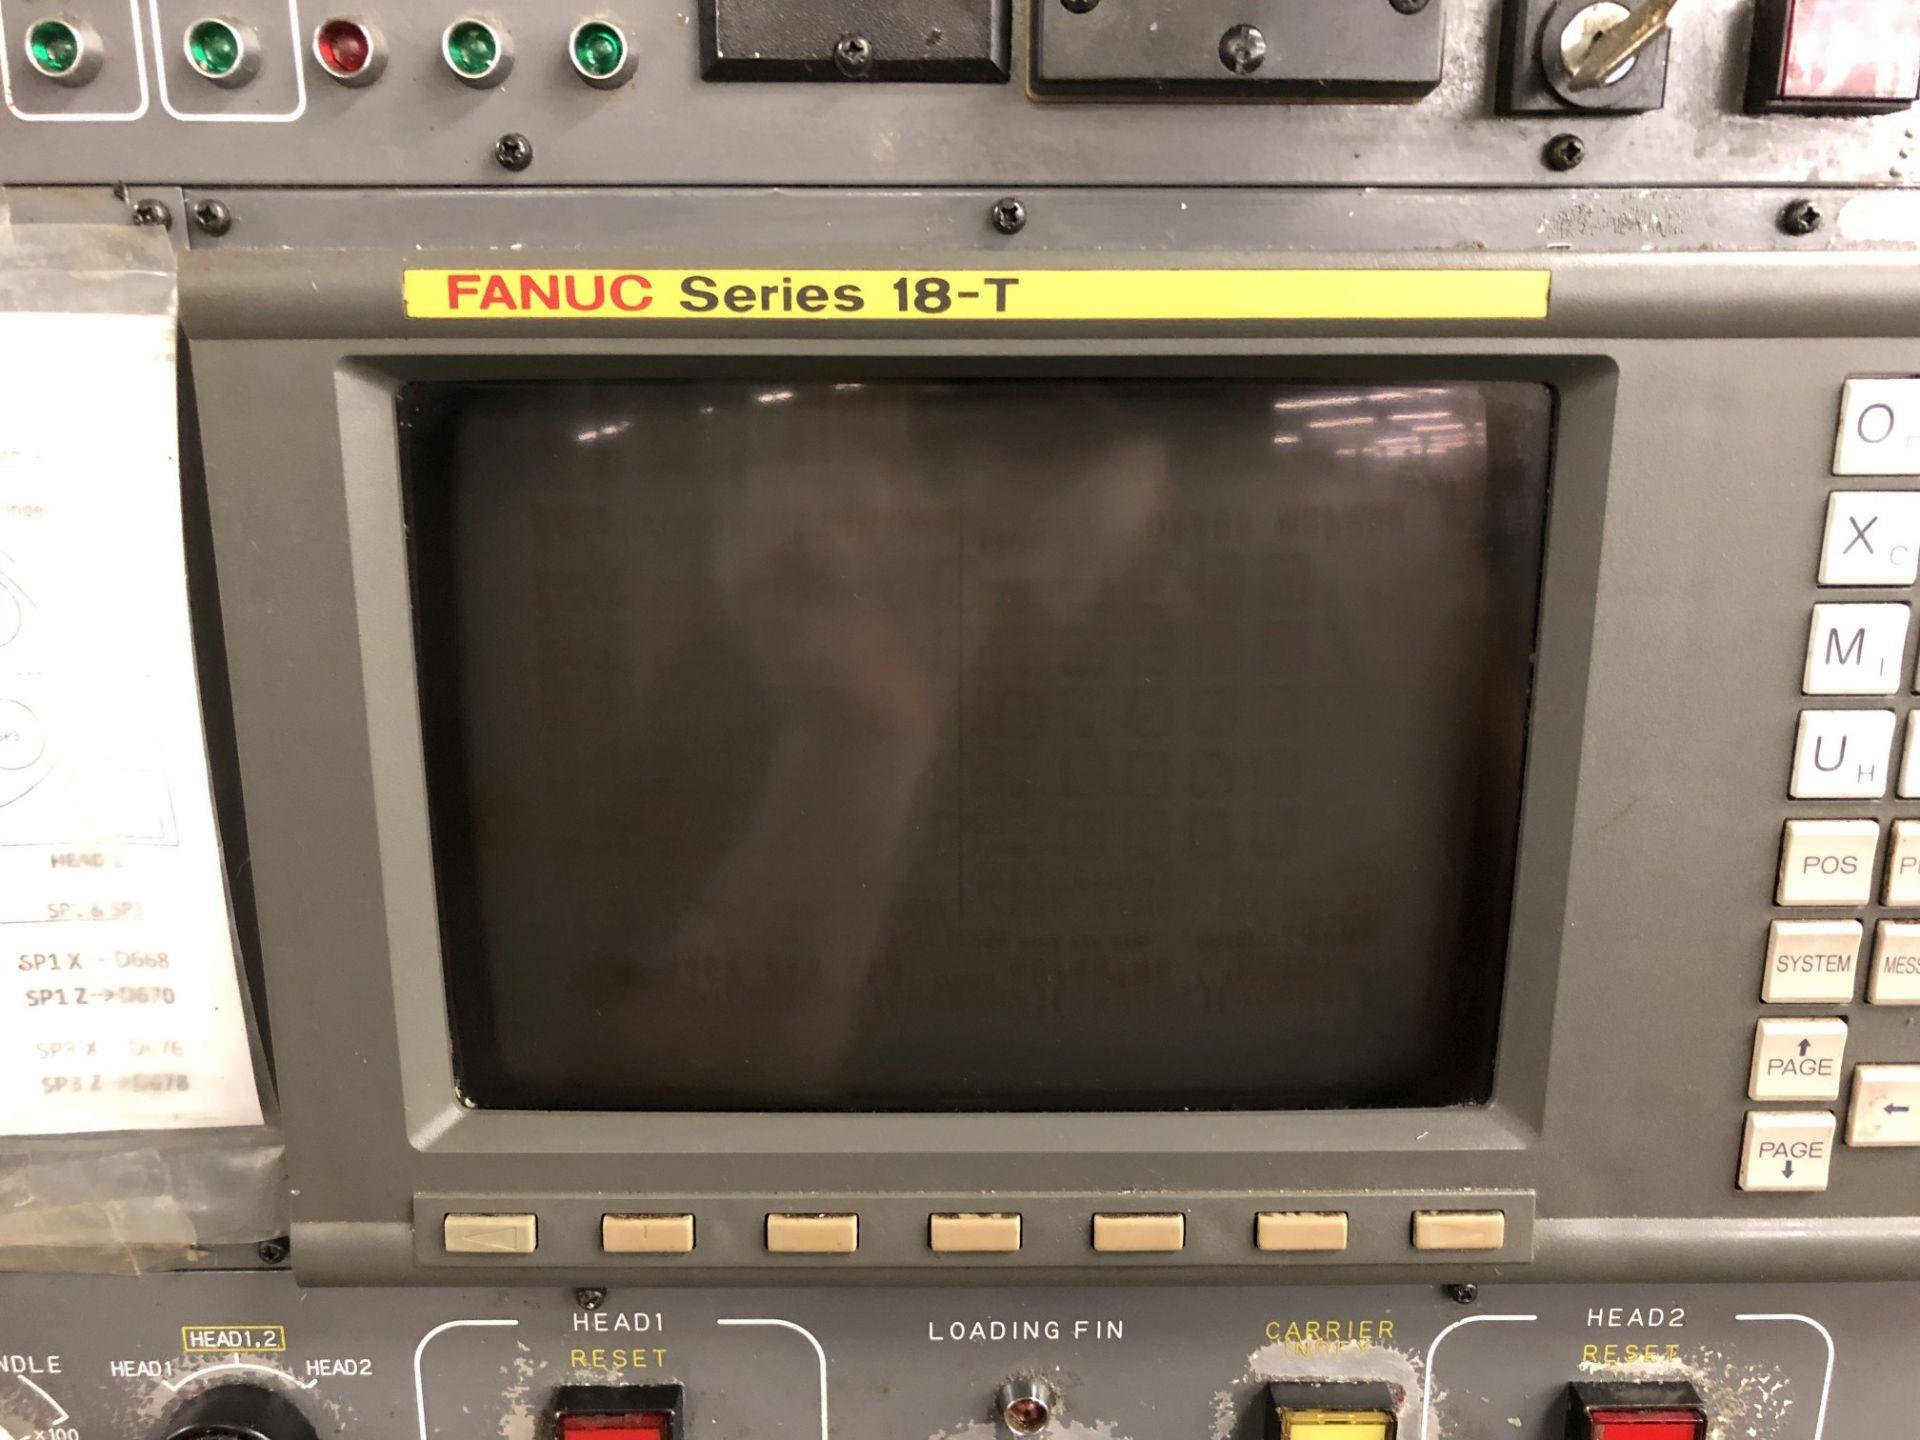 1999 Kitako MT4-200 Multi-Spindle CNC Turning Mill - Image 6 of 16